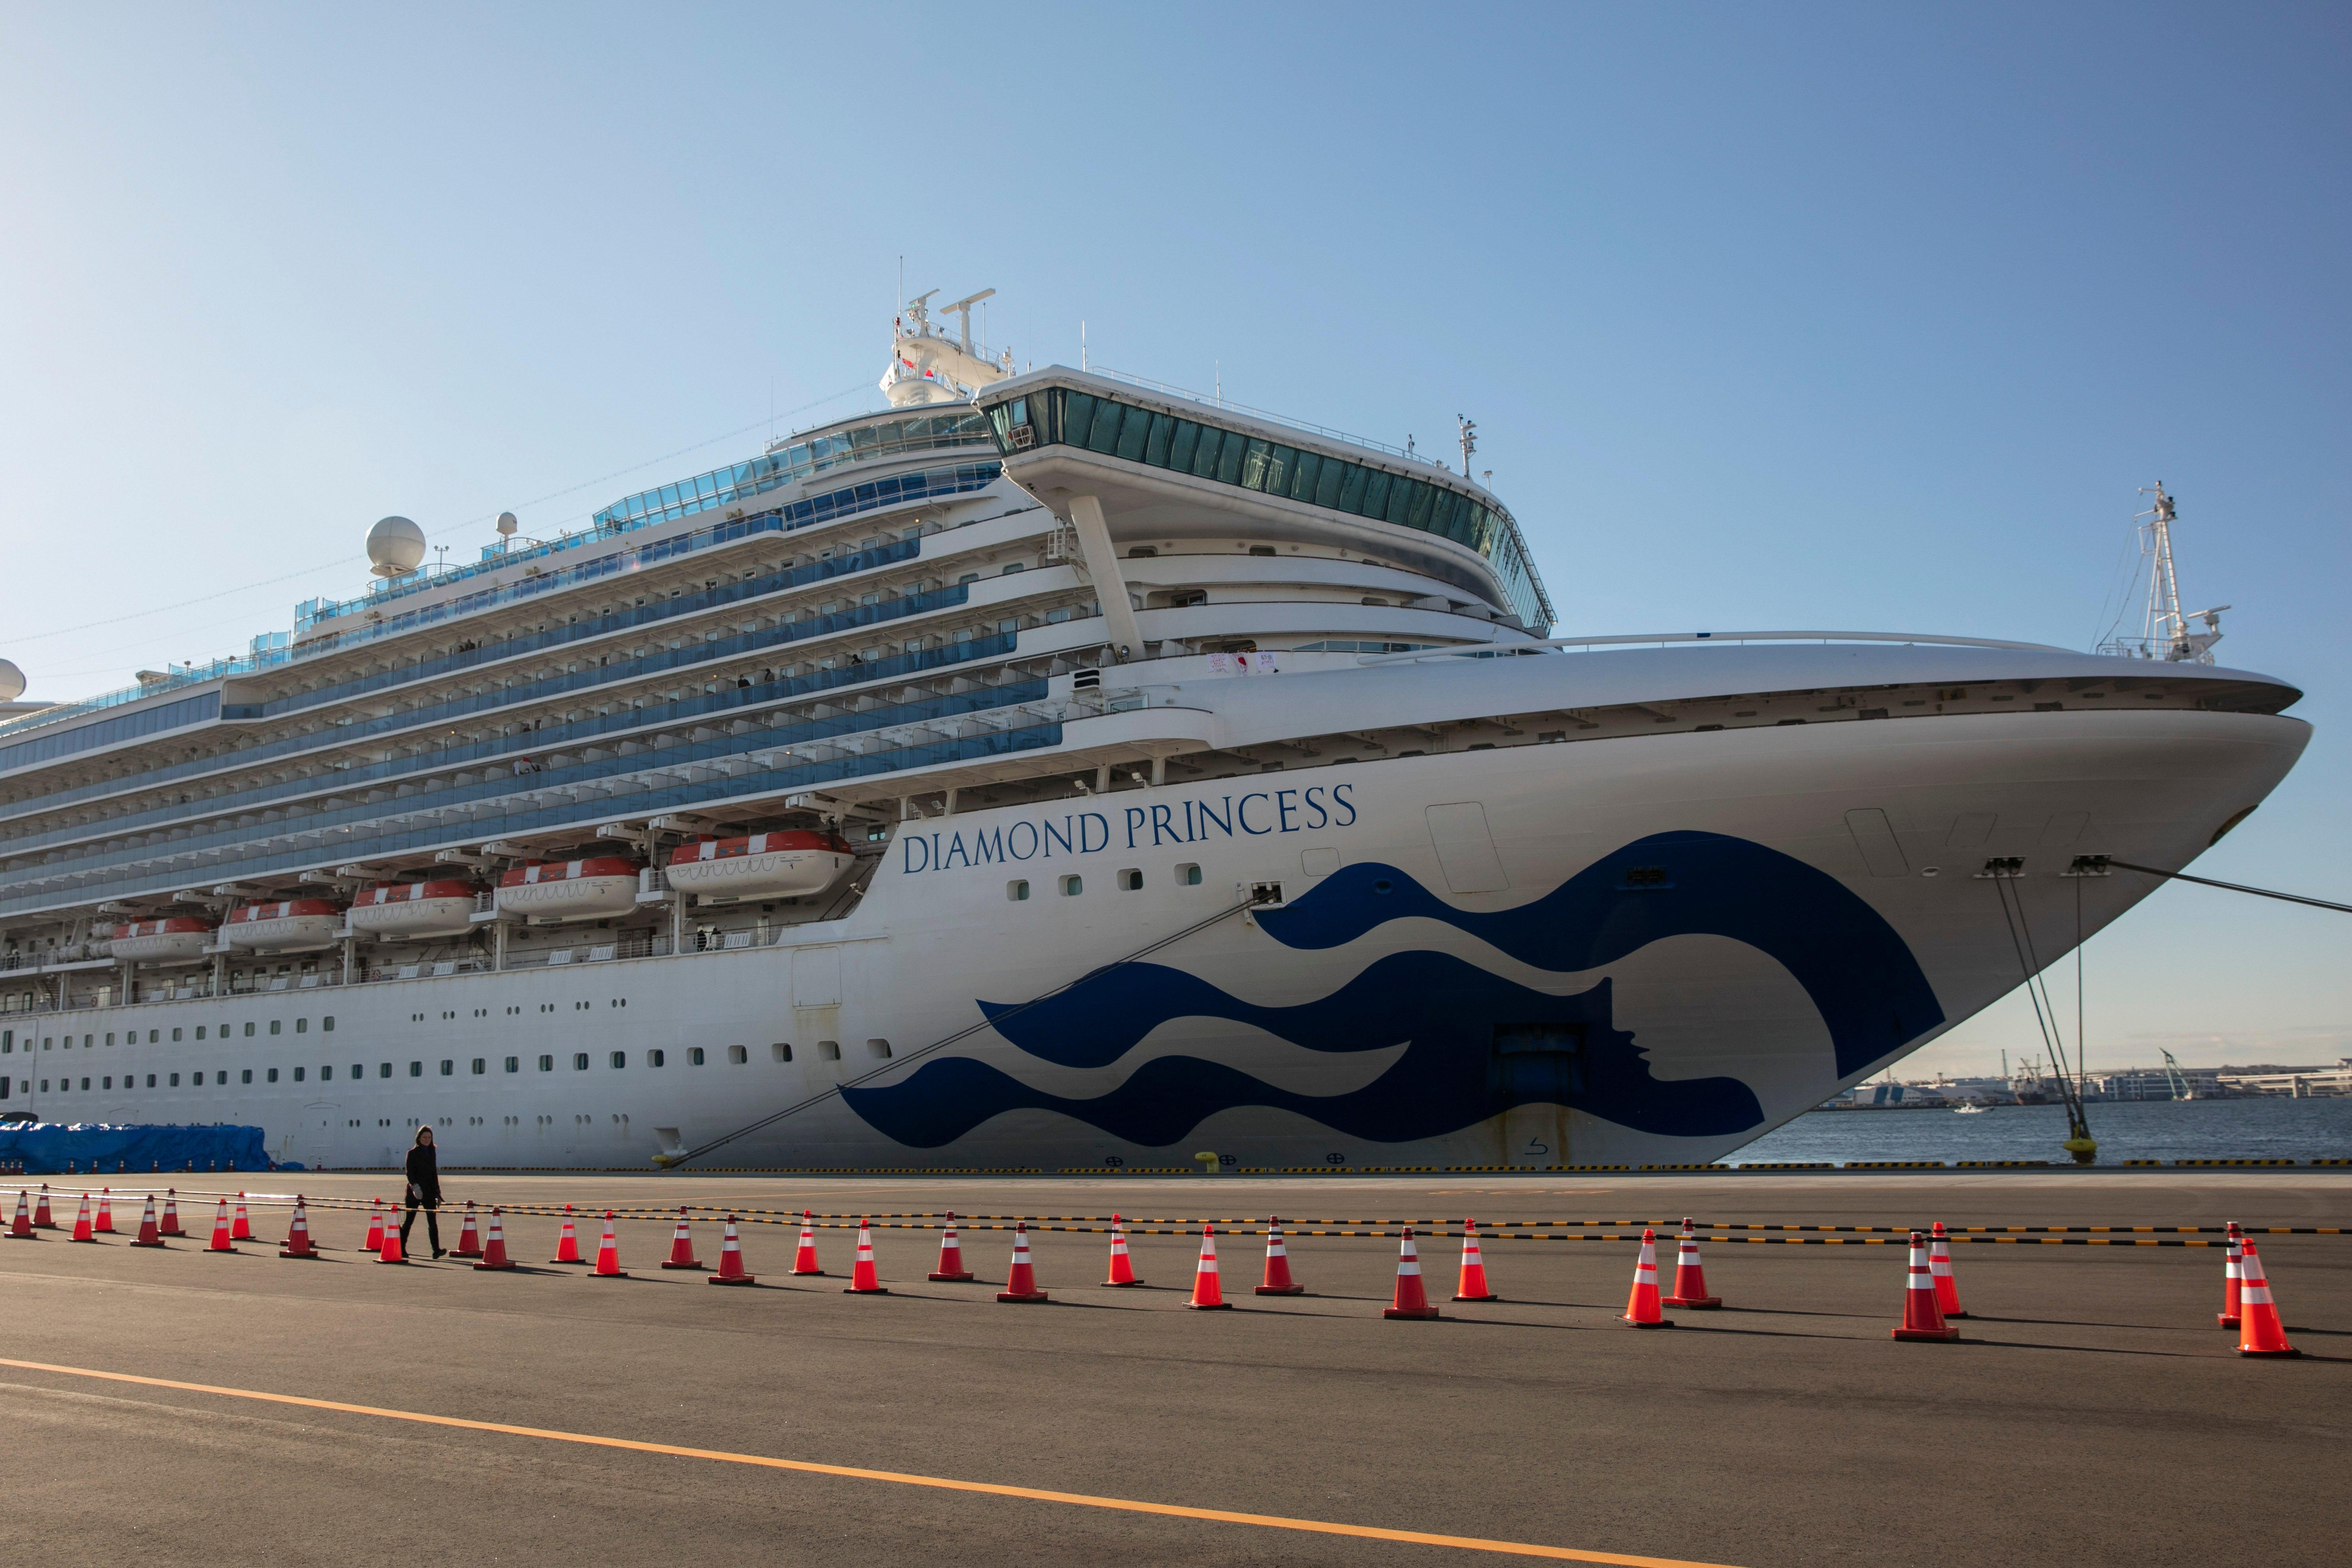 Coronavirus-quarantined passengers on Diamond Princess ship fed by celebrity chef Jose Andres